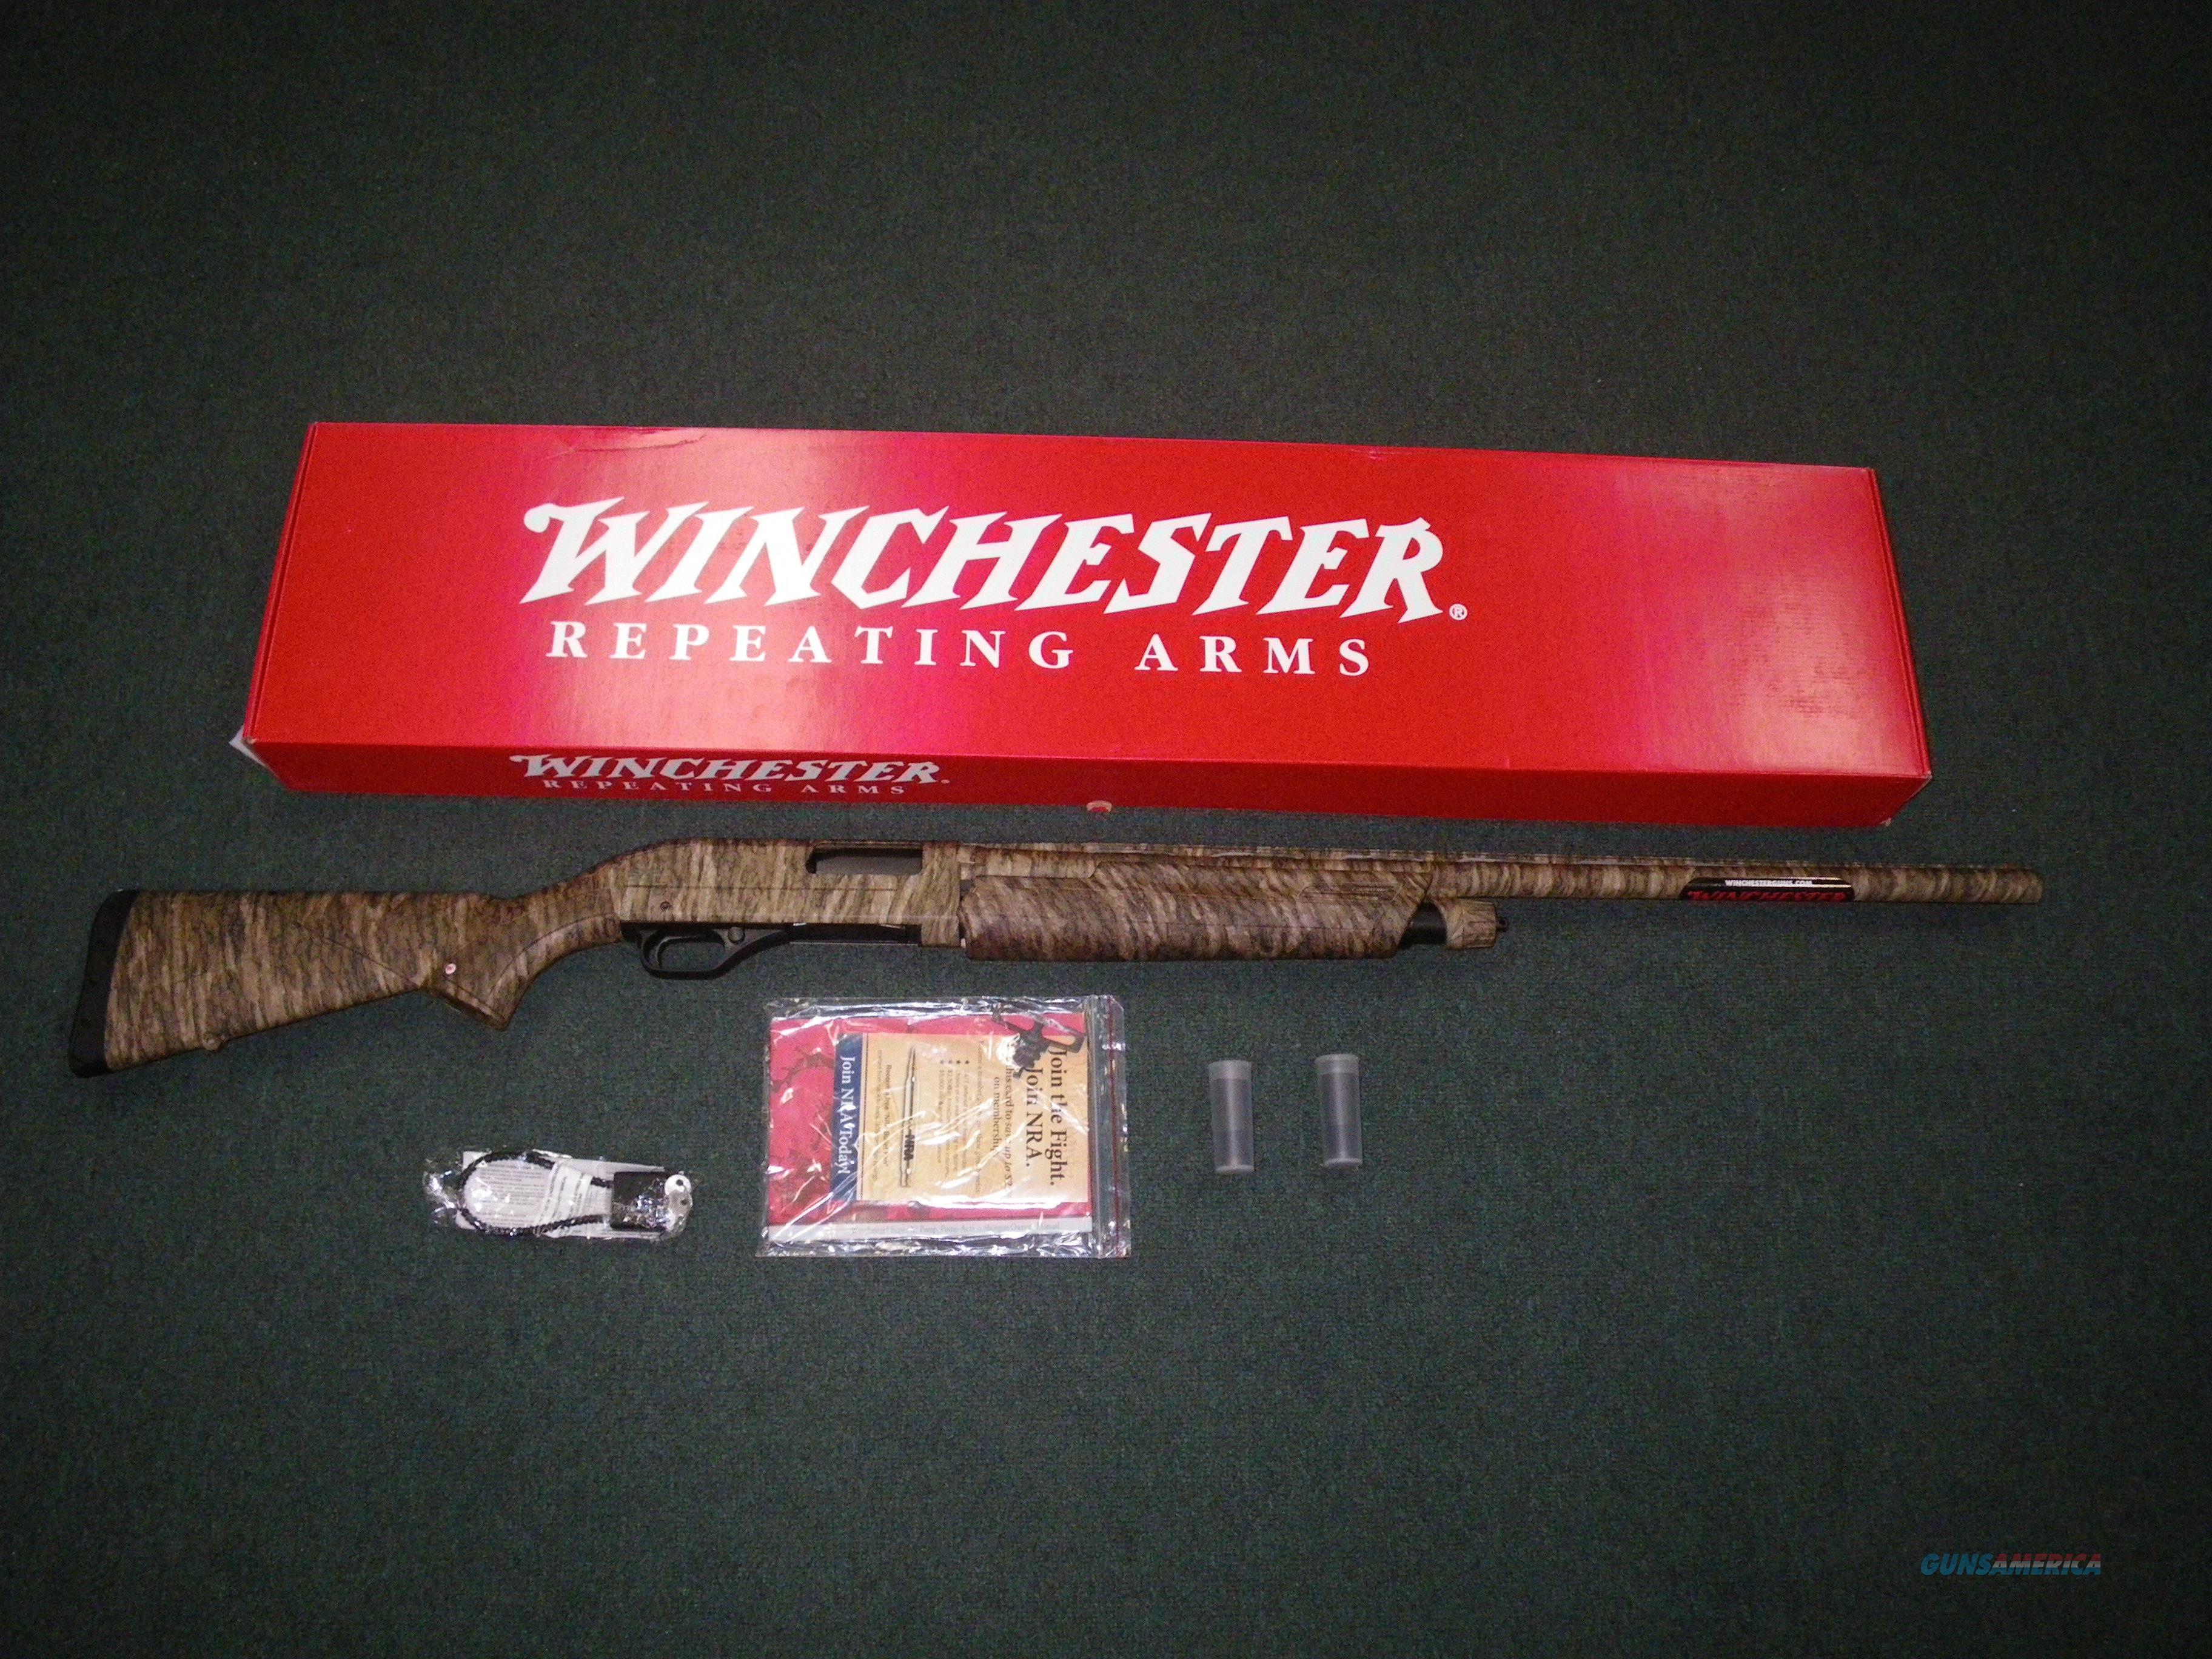 "Winchester SXP Waterfowl Btmlnd 20ga 26"" NEW 3"" #512293691  Guns > Shotguns > Winchester Shotguns - Modern > Pump Action > Hunting"